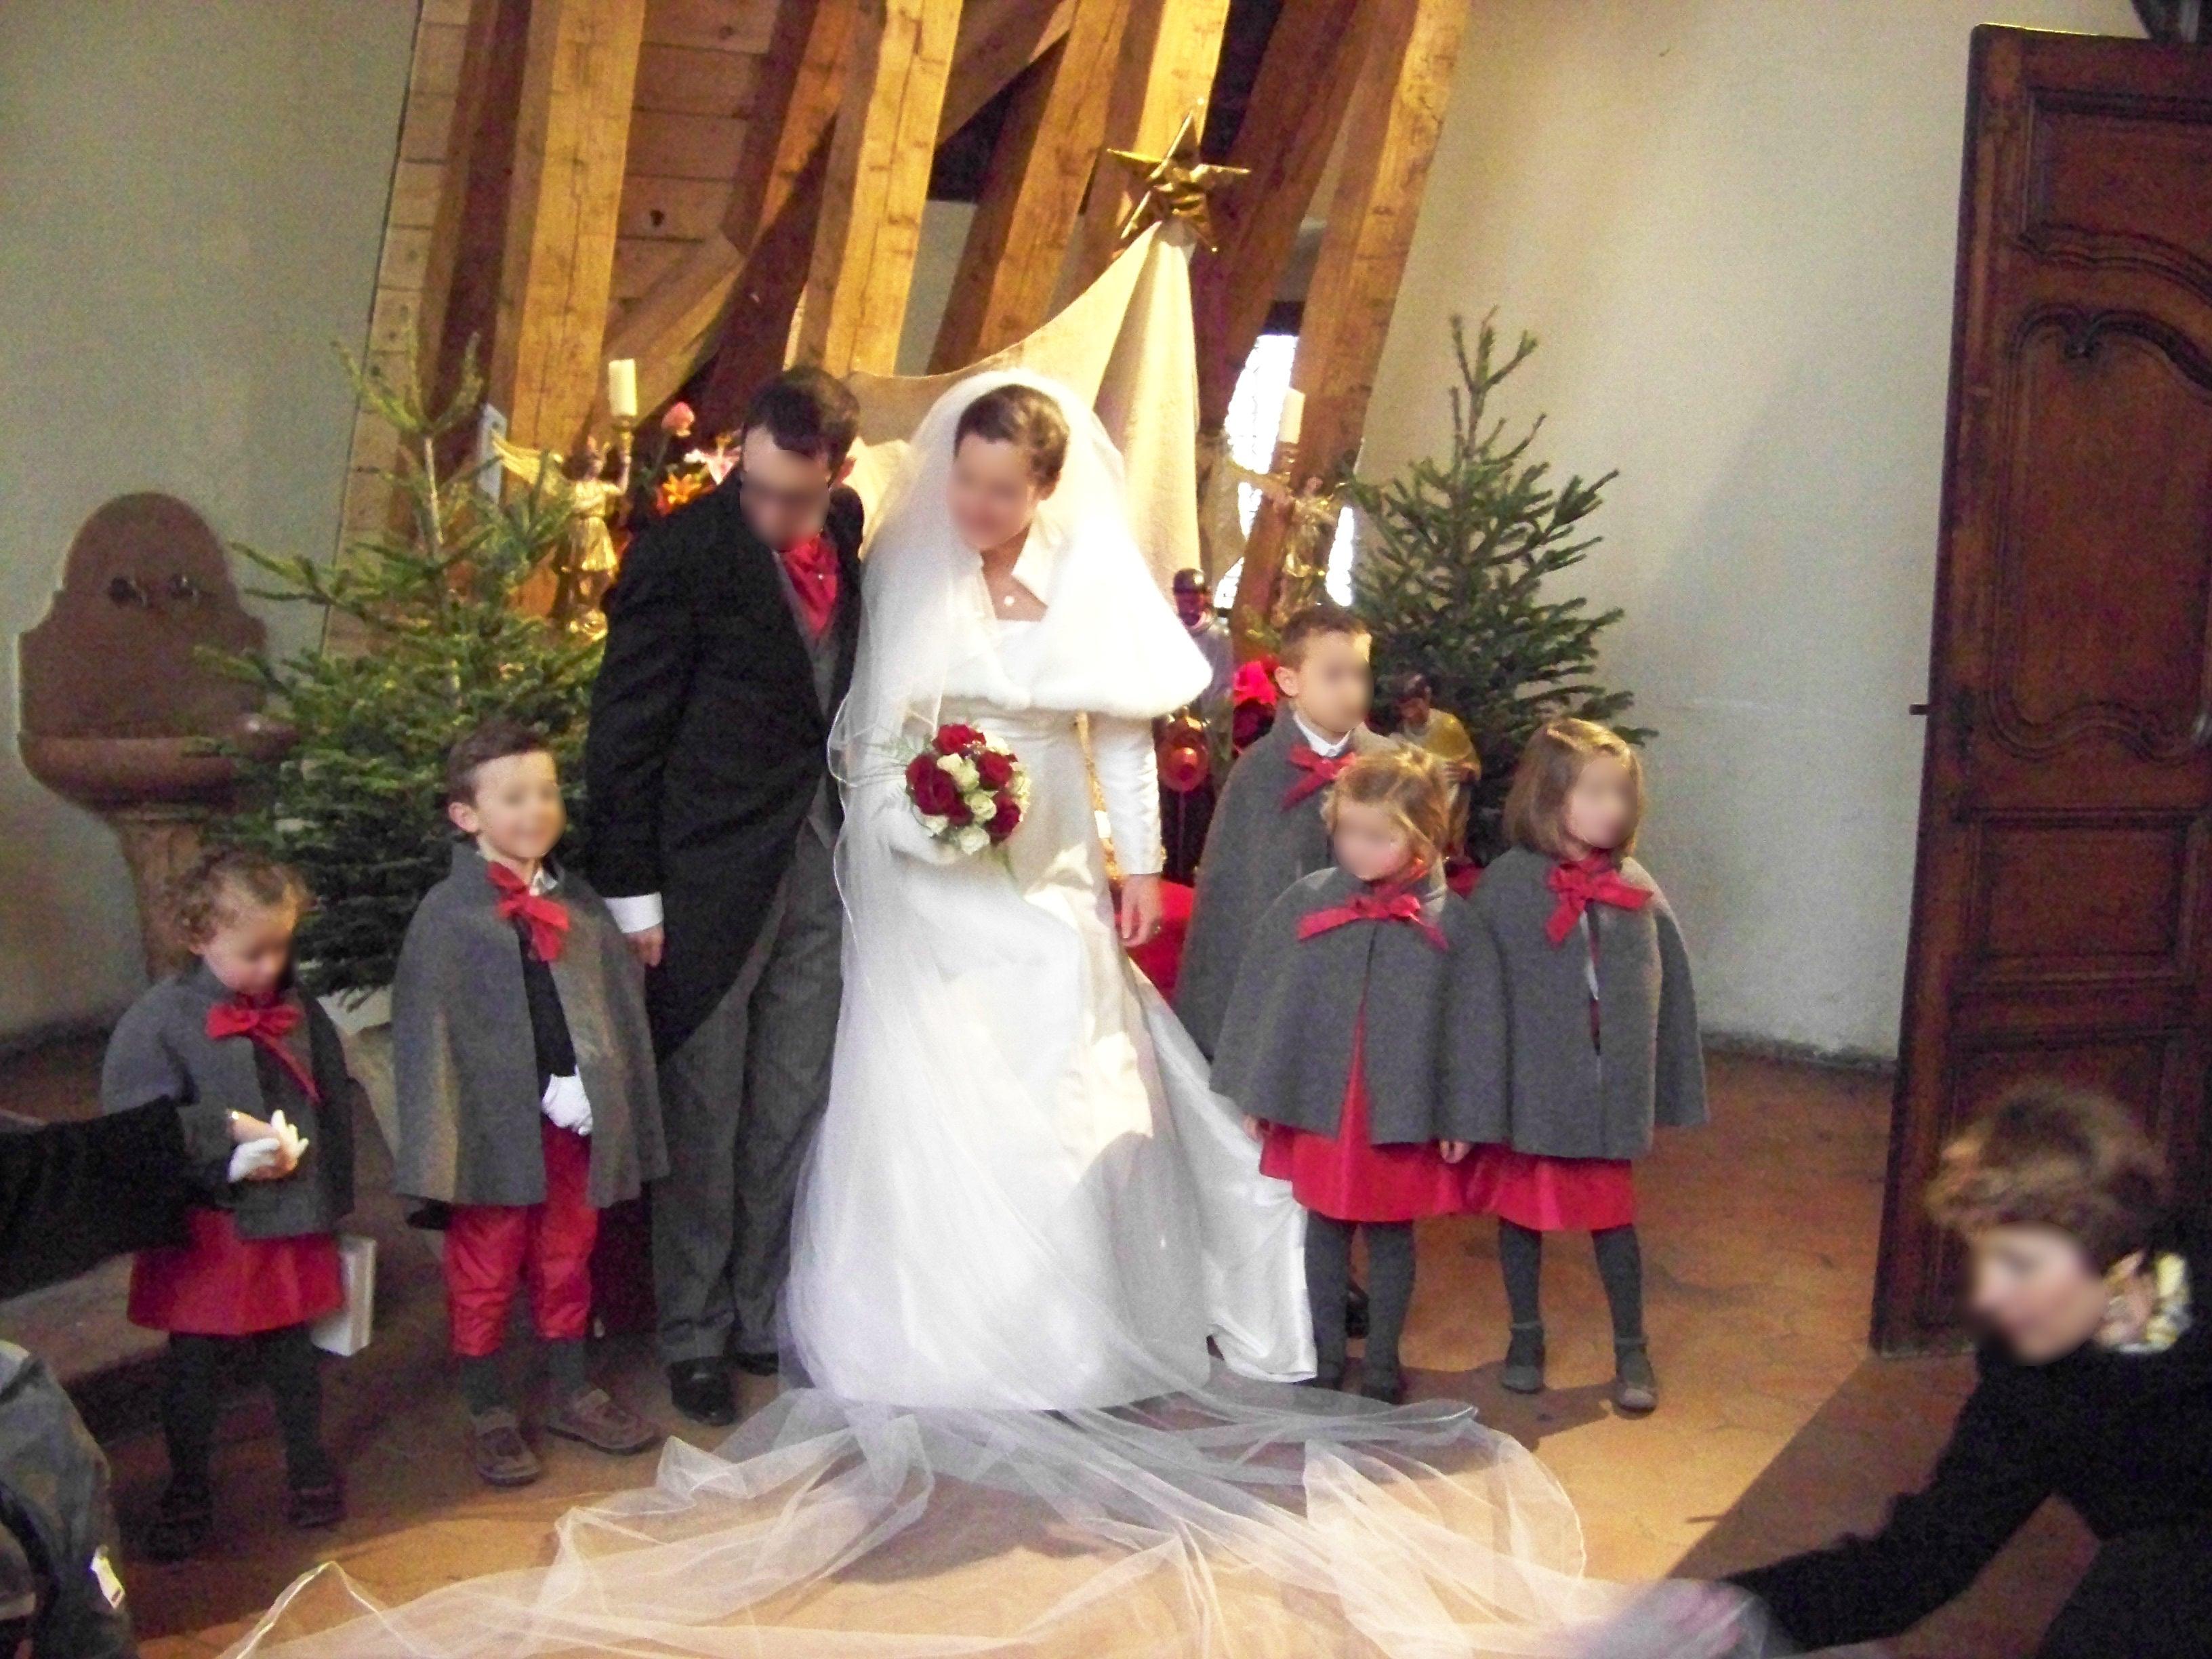 Cort ge d 39 hiver robes framboise for Robe et manteau pour mariage d hiver